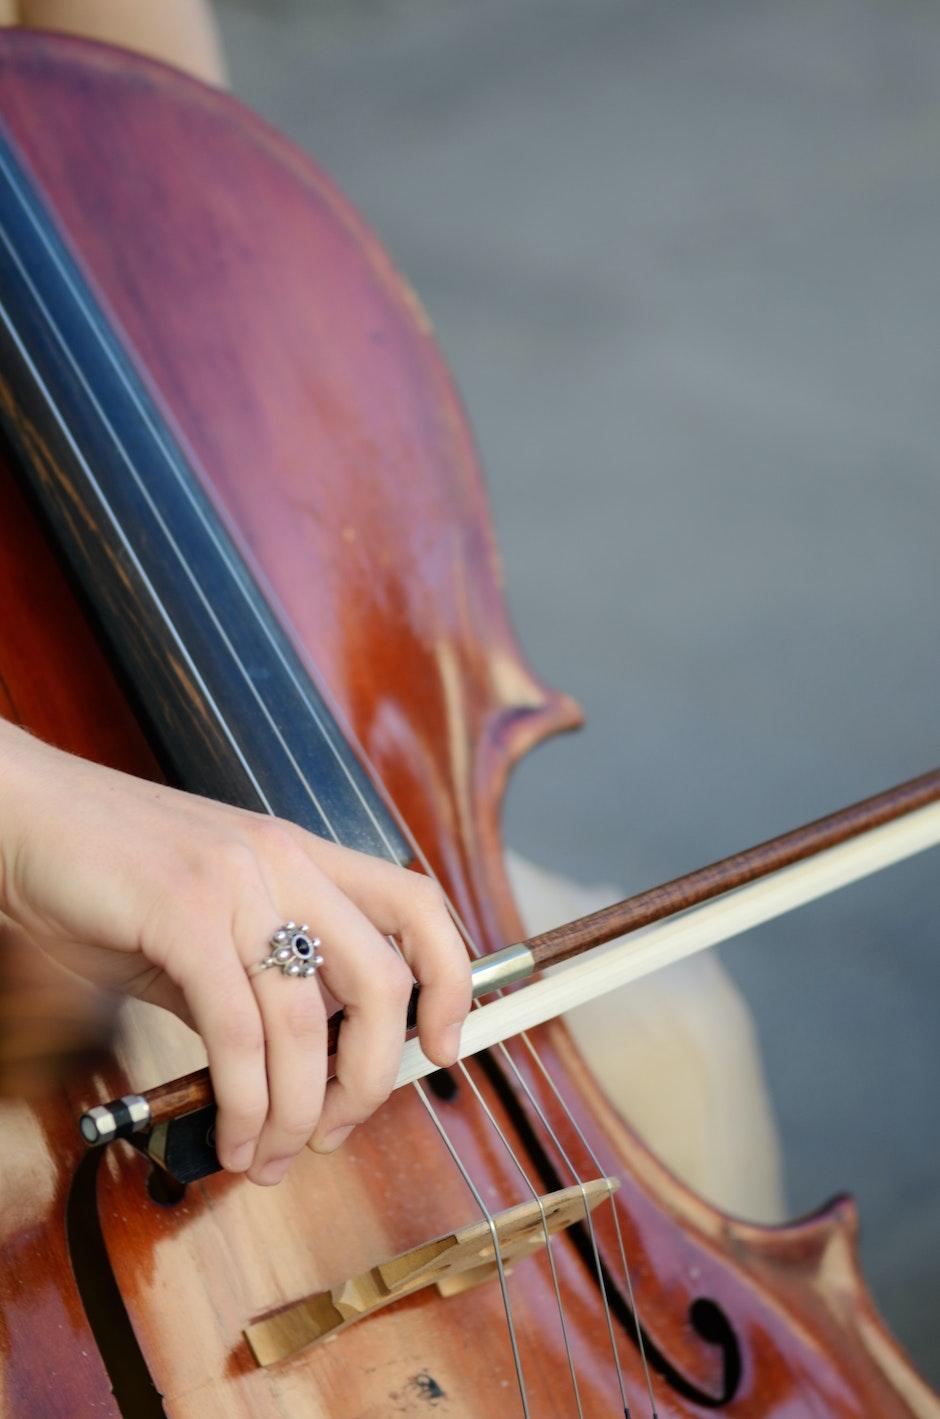 cellist, cello, classical music